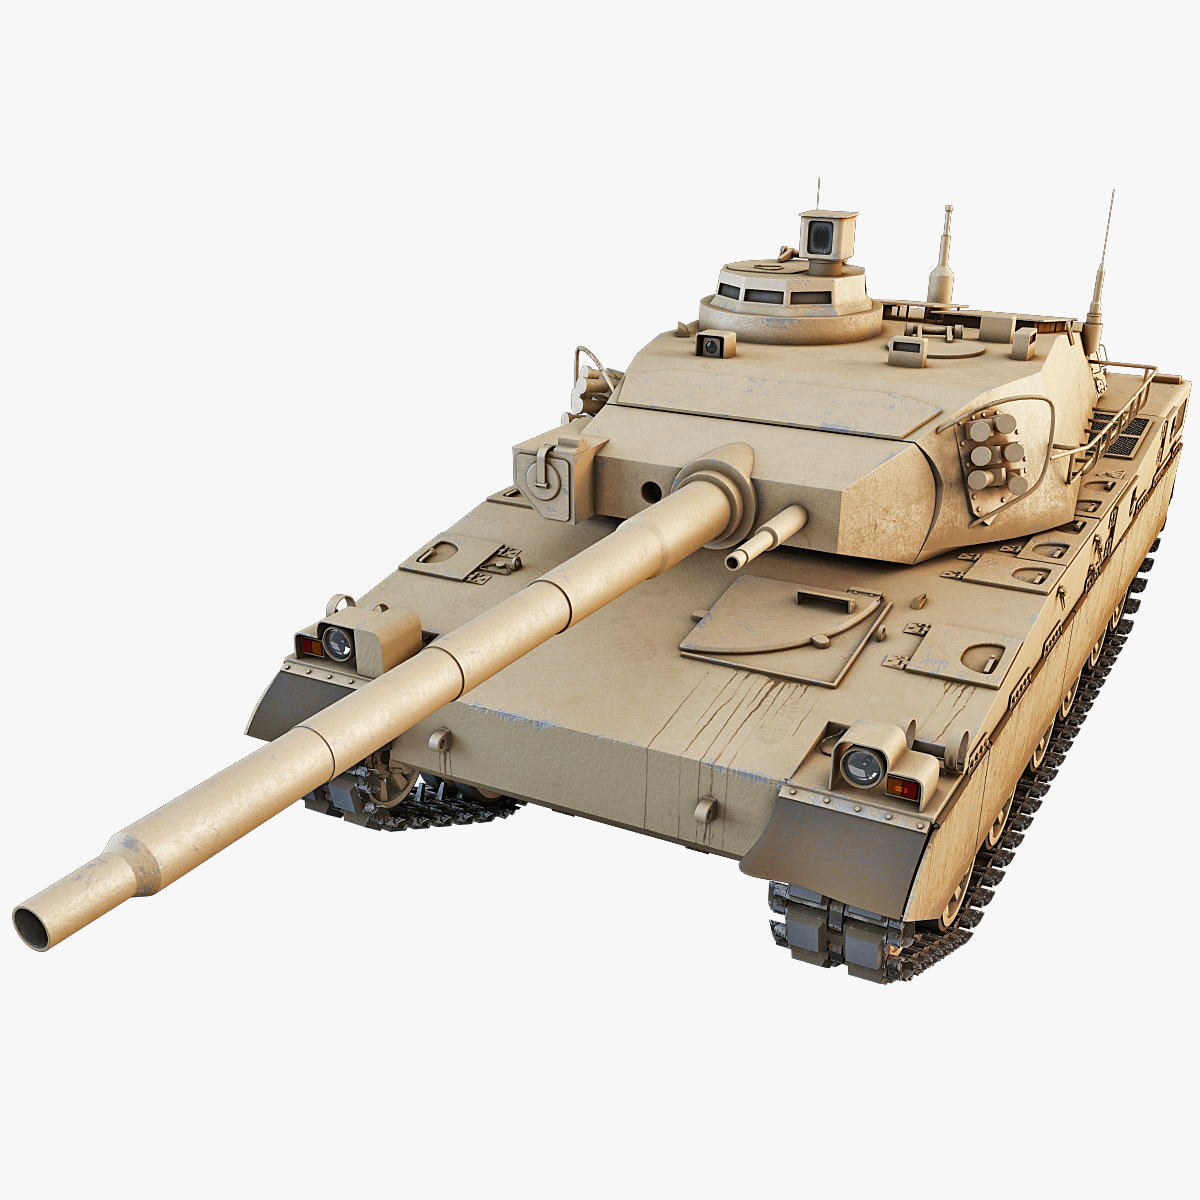 AMX-40_French_Main_Battle_Tank_2_000.jpg